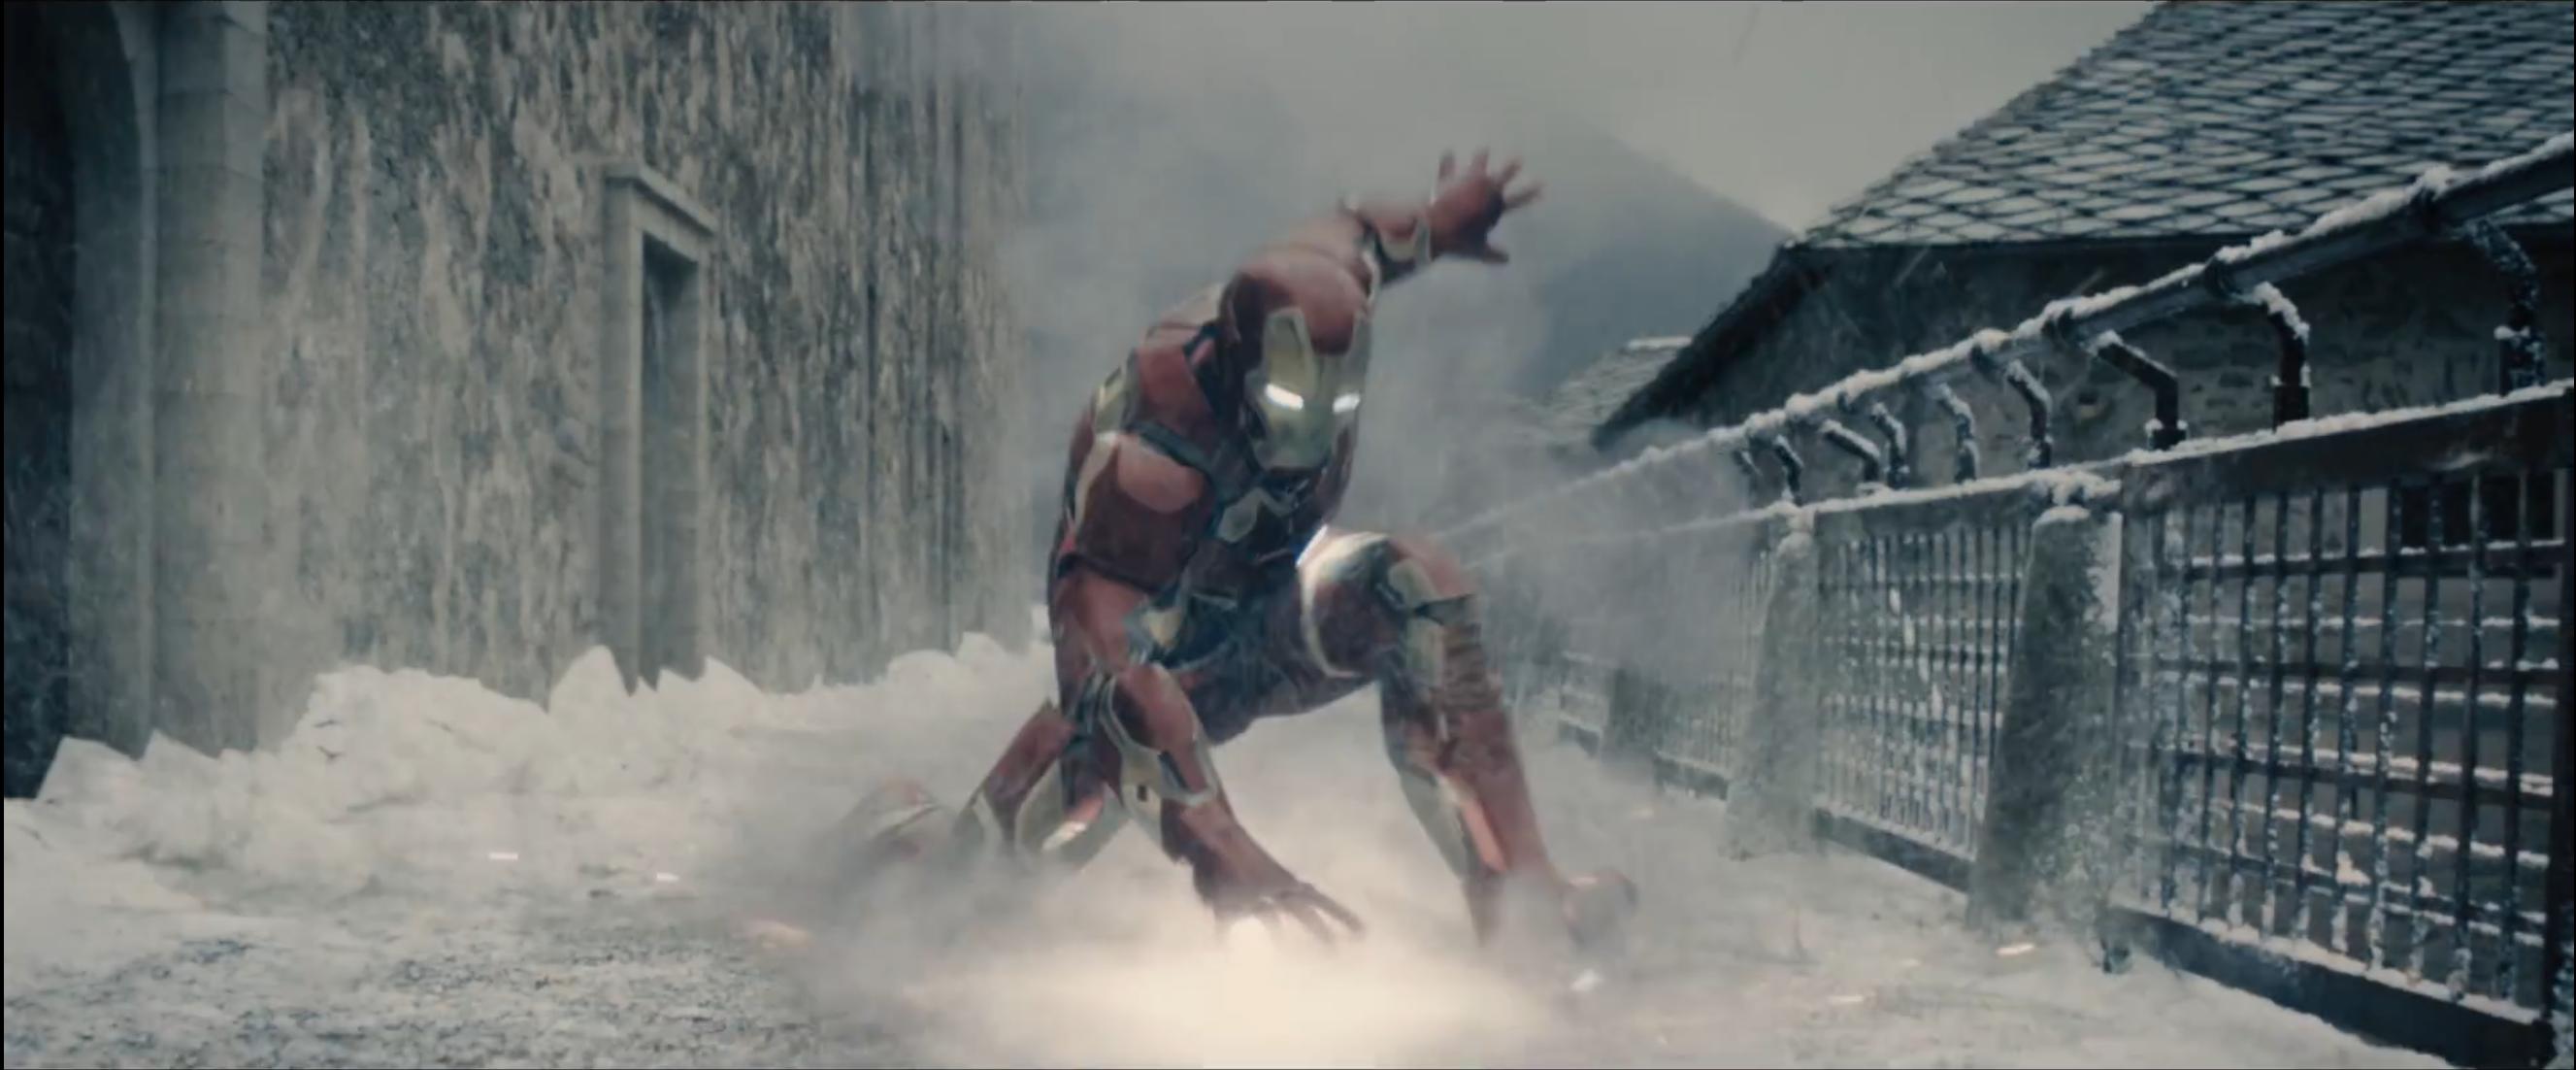 Iron Man in una immagine dal trailer di Avengers: Age of Ultron